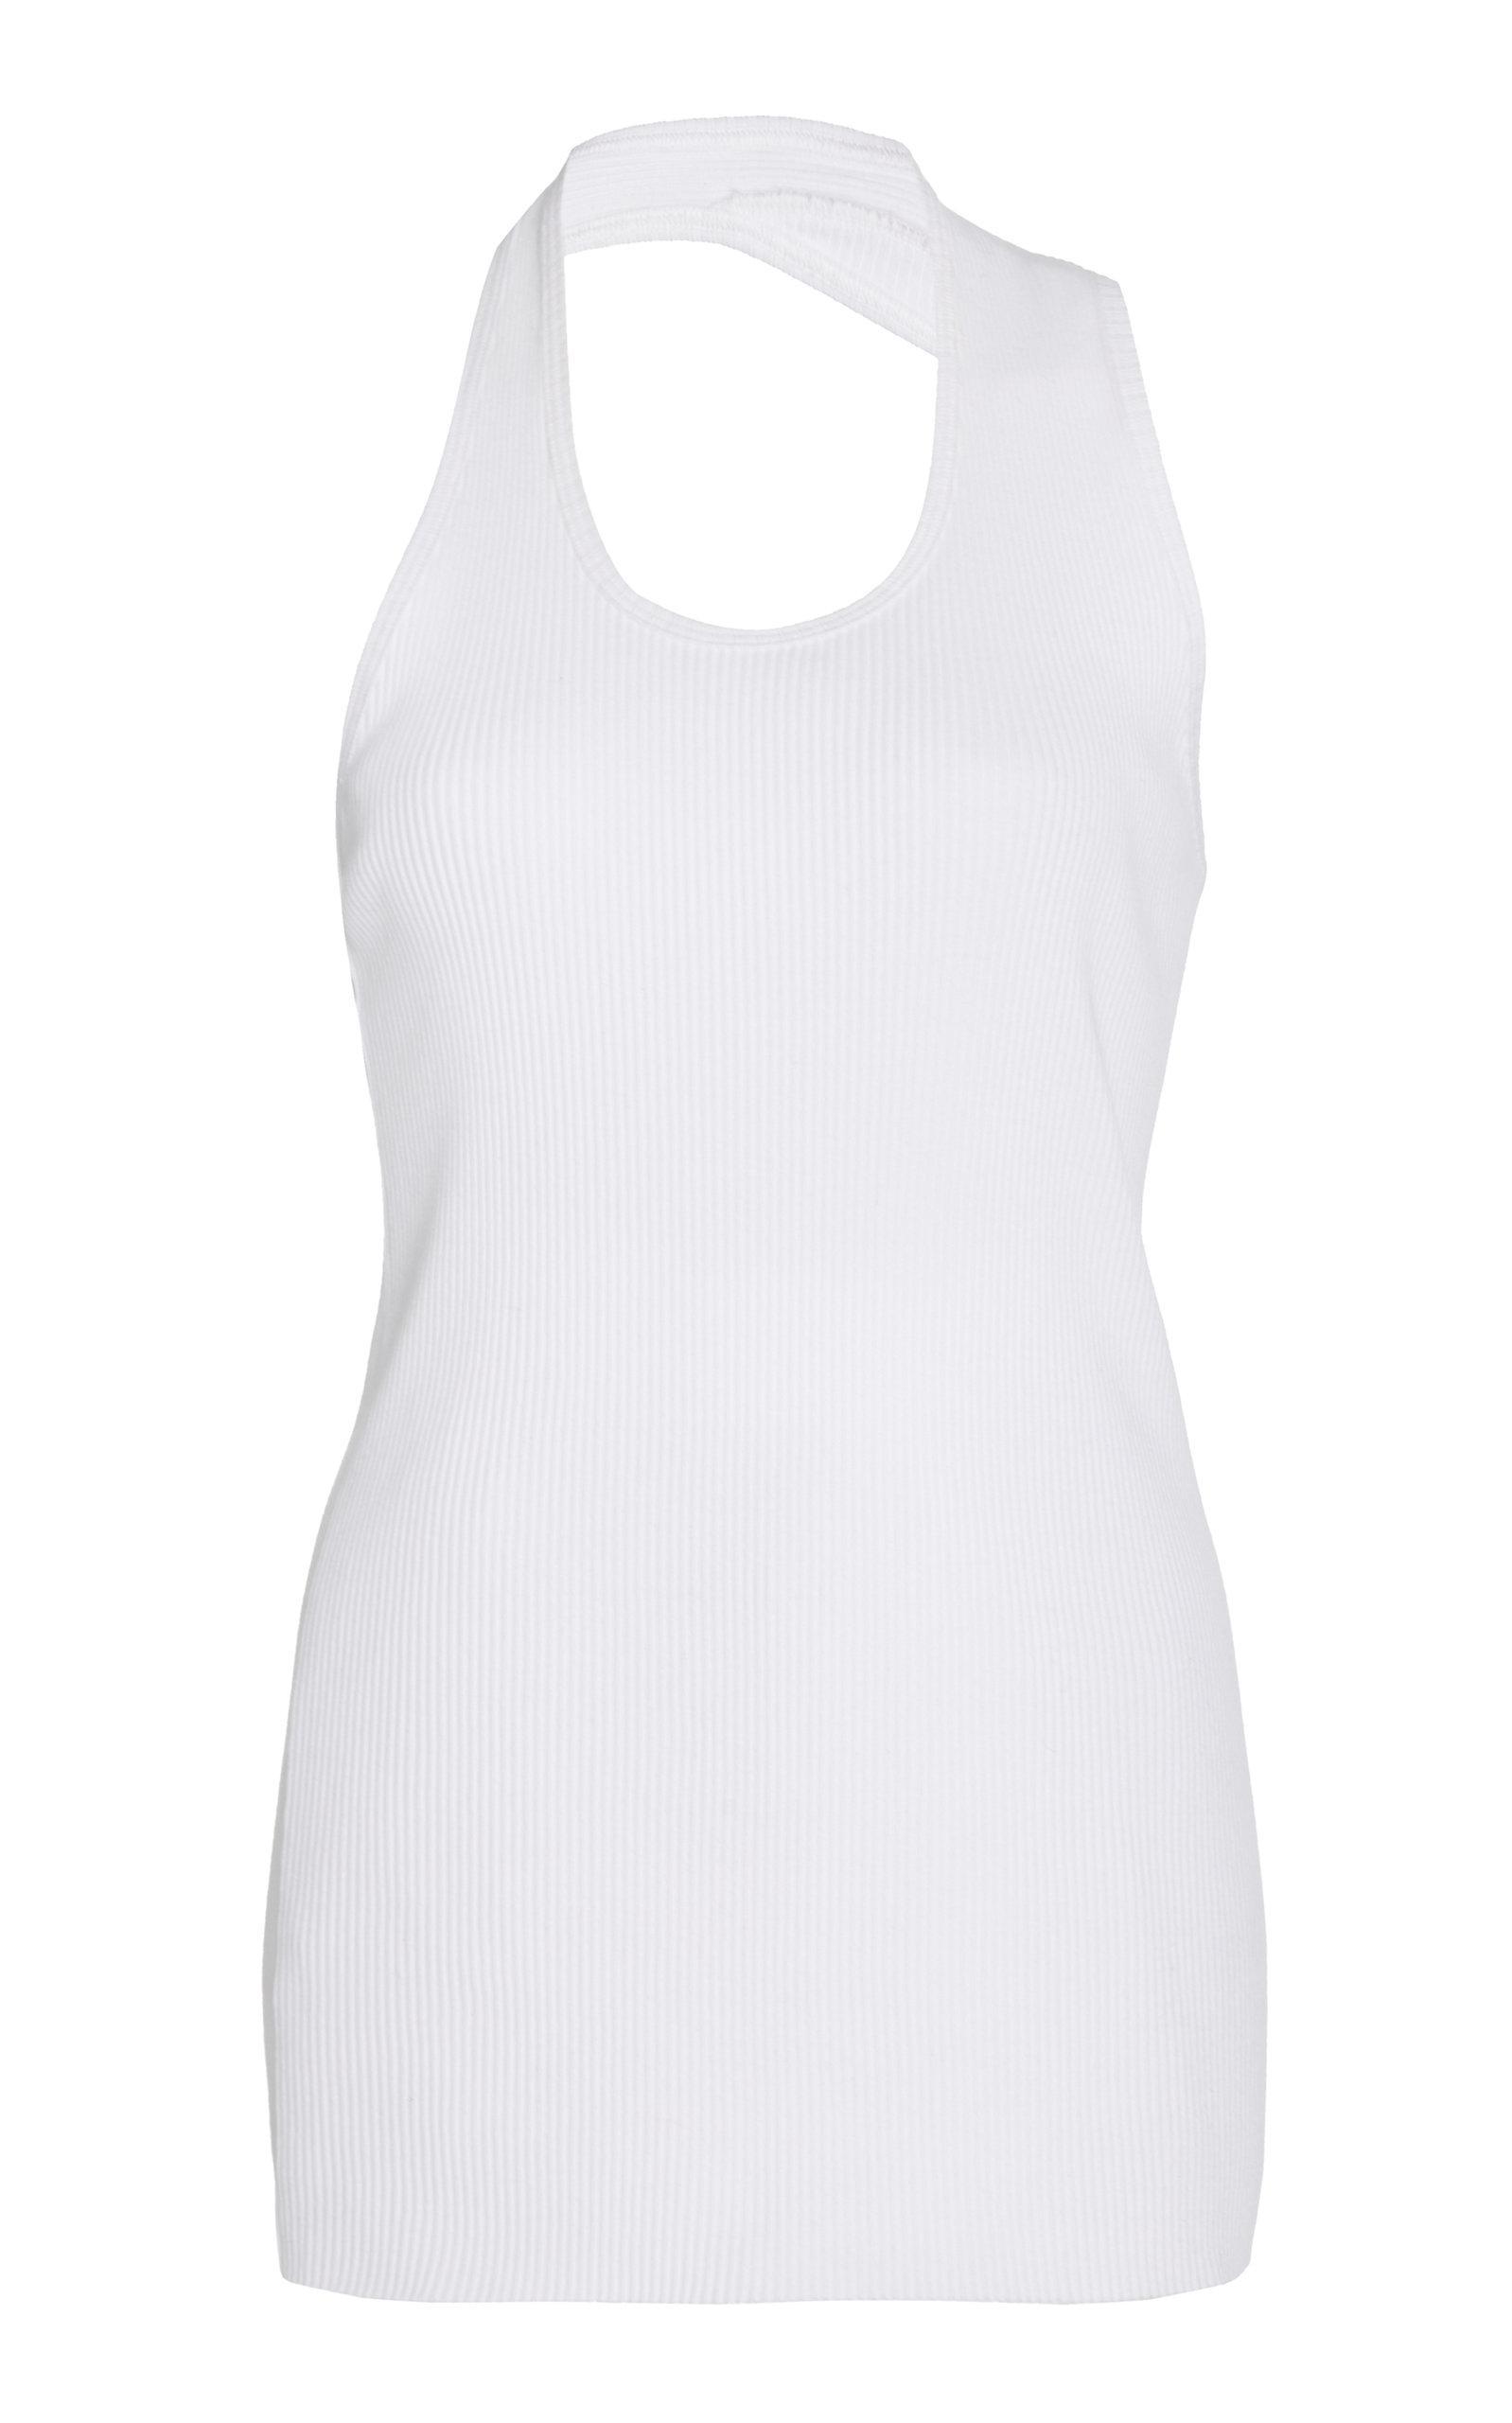 8816ea31ea6 helmut-lang-white-Asymmetric-Cotton-rib-Tank.jpeg